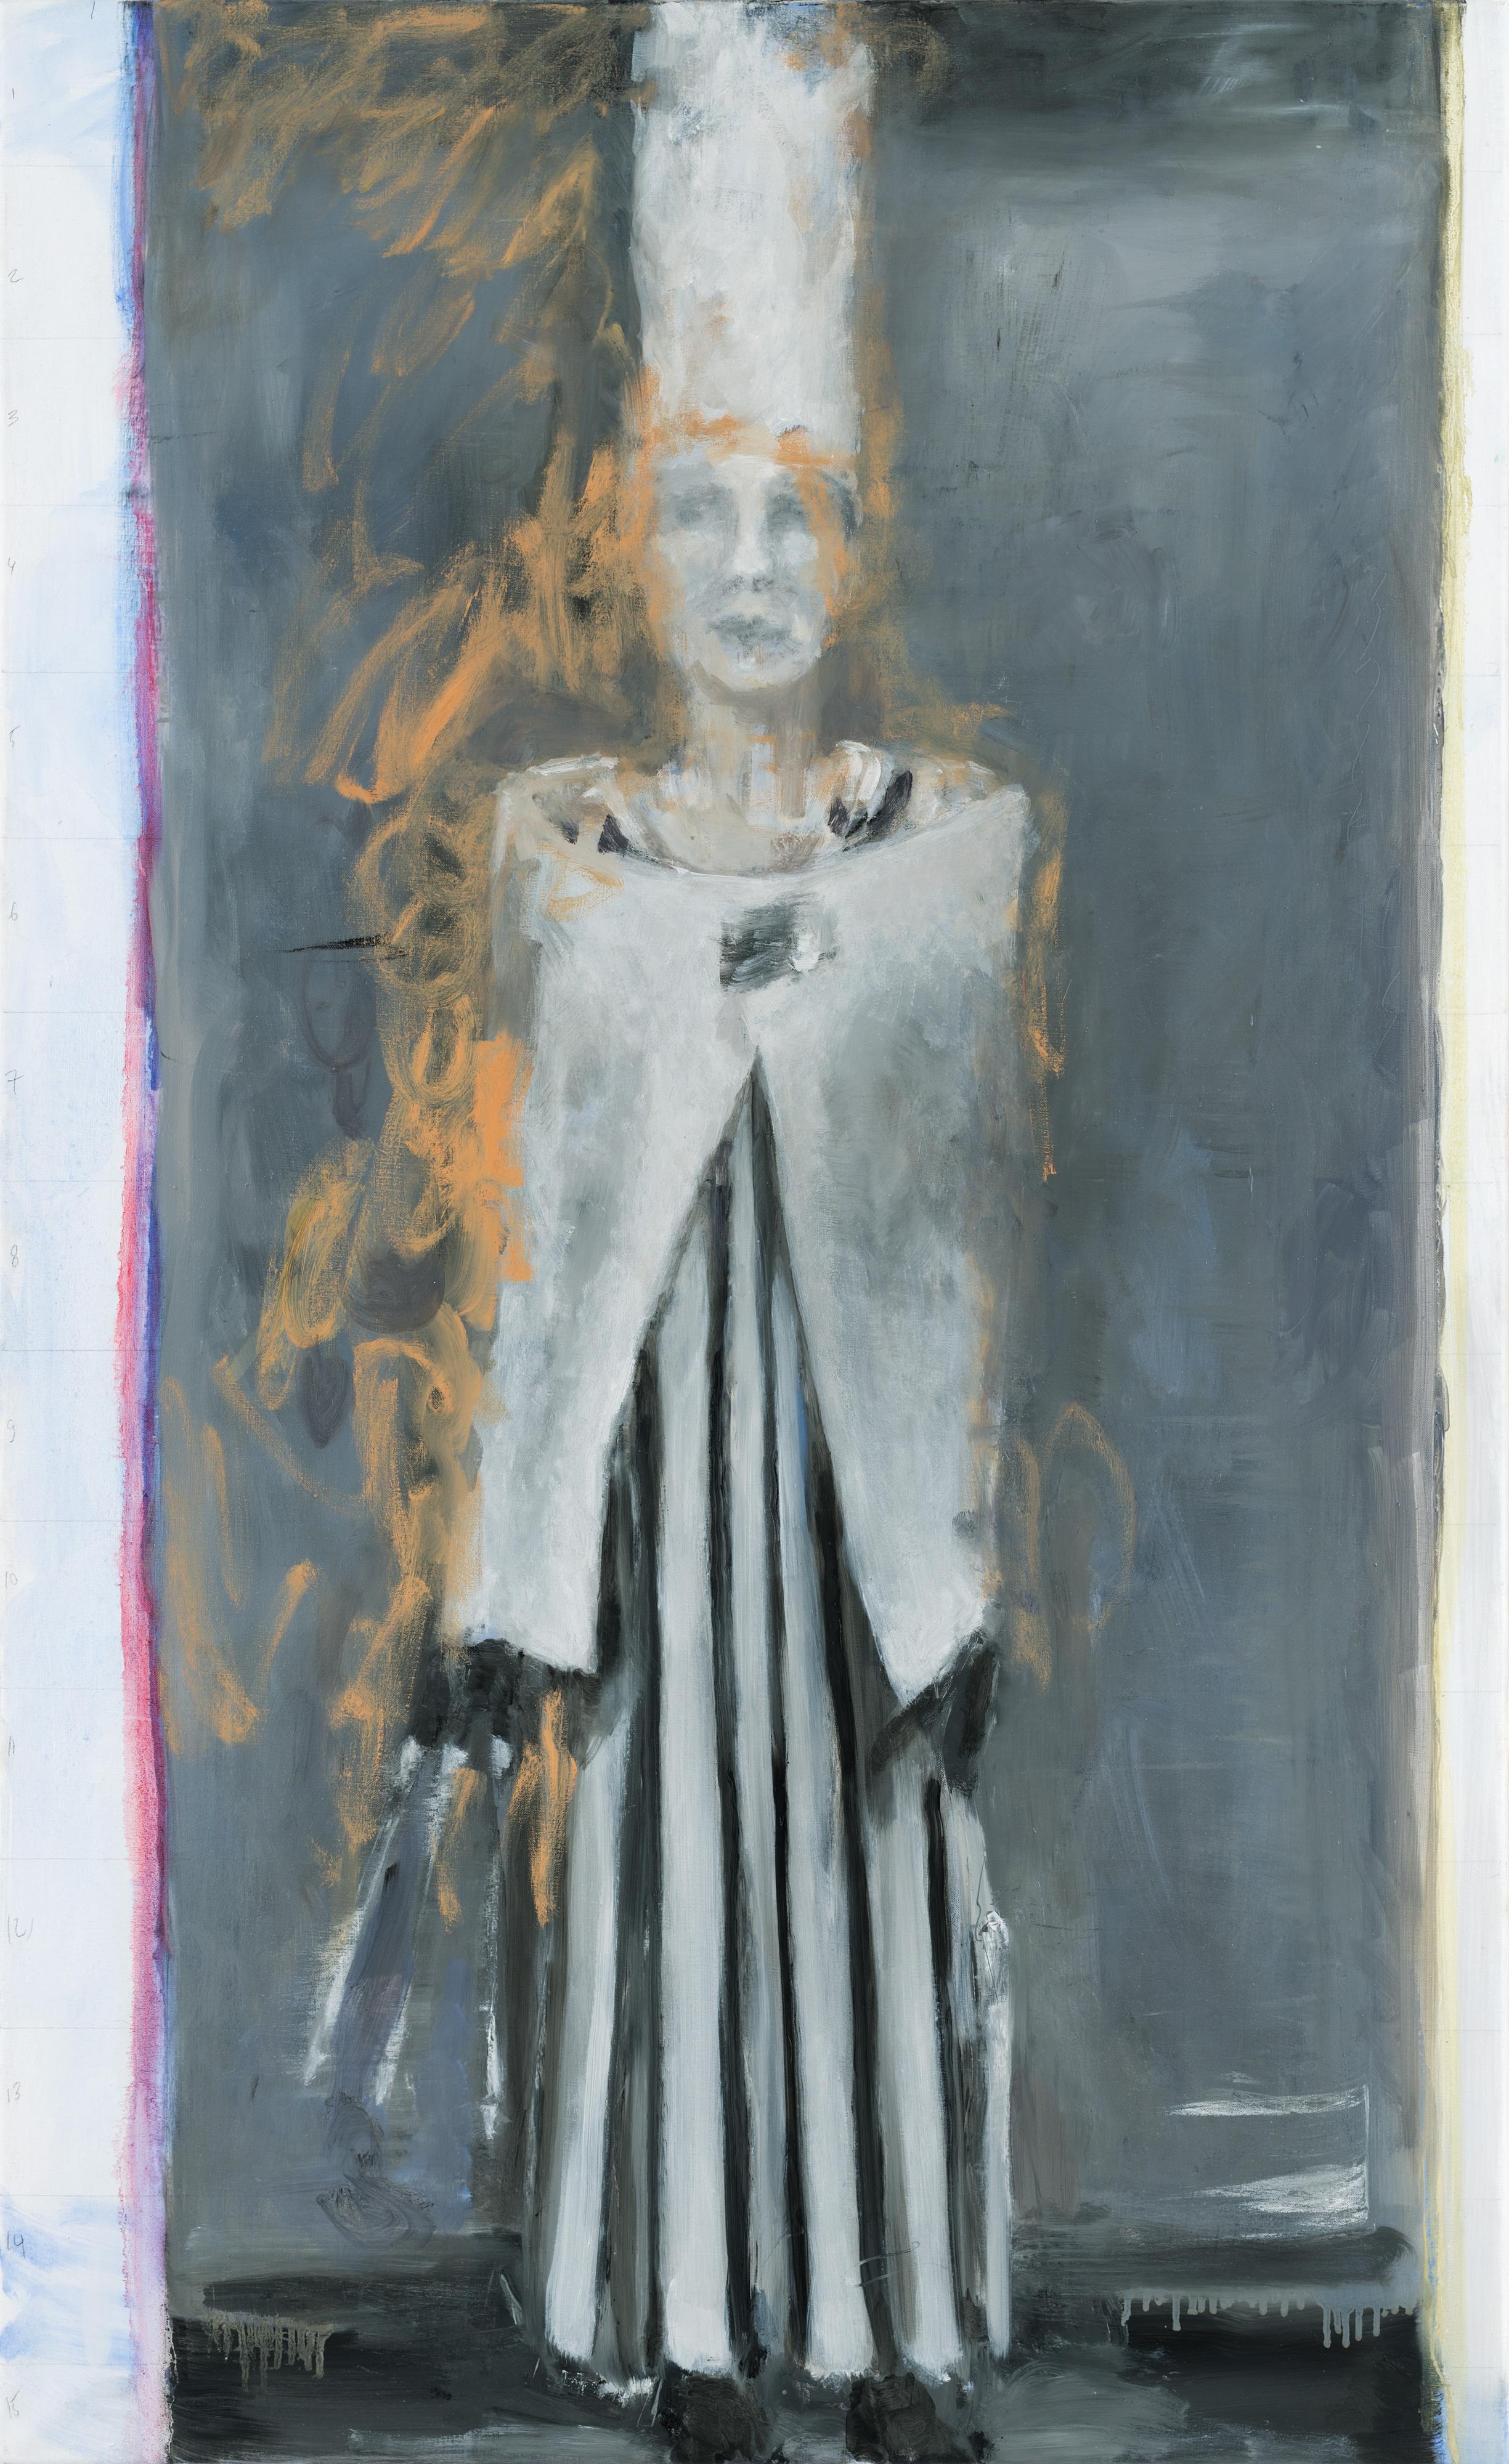 Galerie Barbara Thumm \ Valérie Favre: Redescription Selbst-Portrait (nach Hugo Ball, Dada Poète) N°5 (VFa-16-002) \ Redescription Selbst-Portrait (nach Hugo Ball, Dada Poète) N°5 (2016)